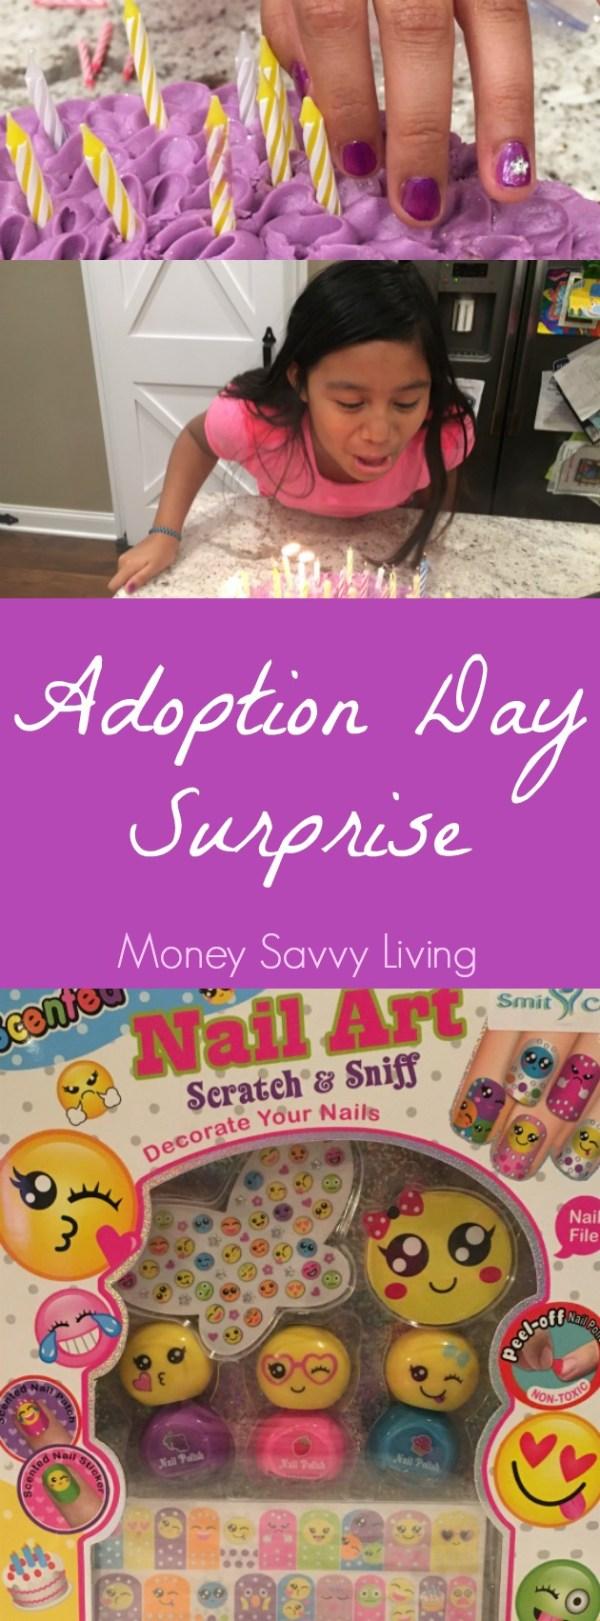 Adoption Day Surprise | Money Savvy Living